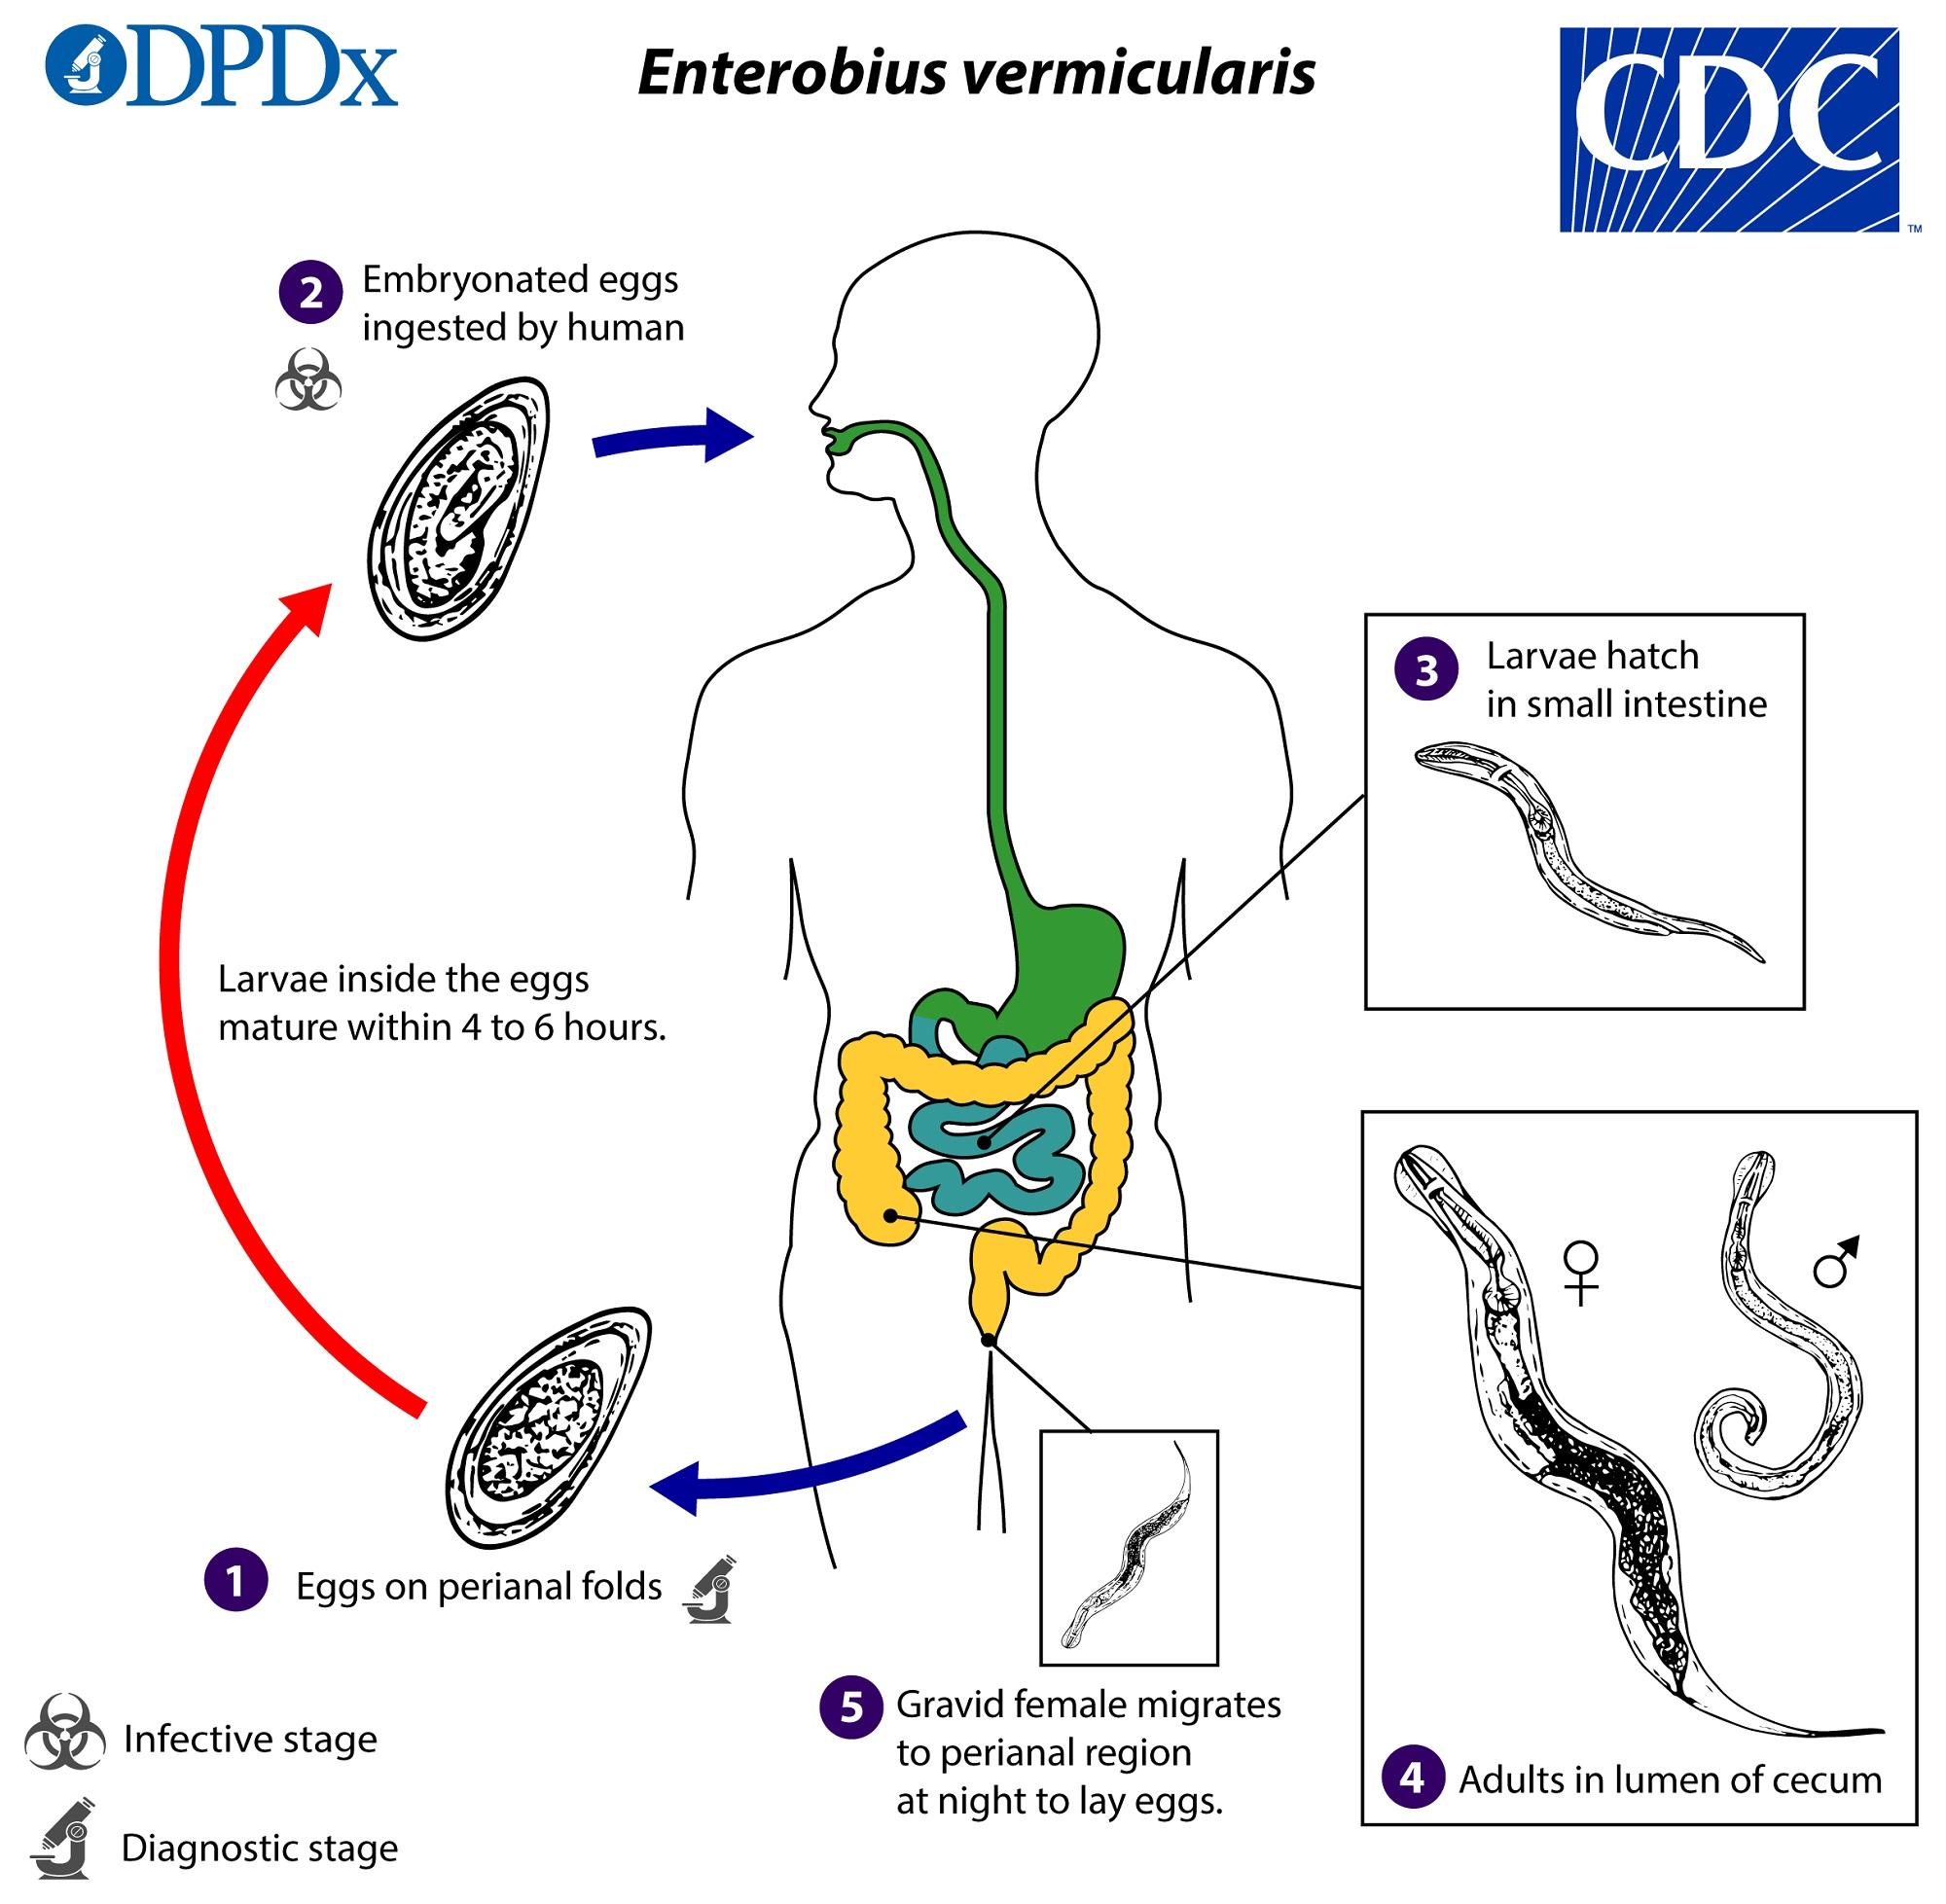 emberi papillomavírus illóolaj jóindulatú vérrák